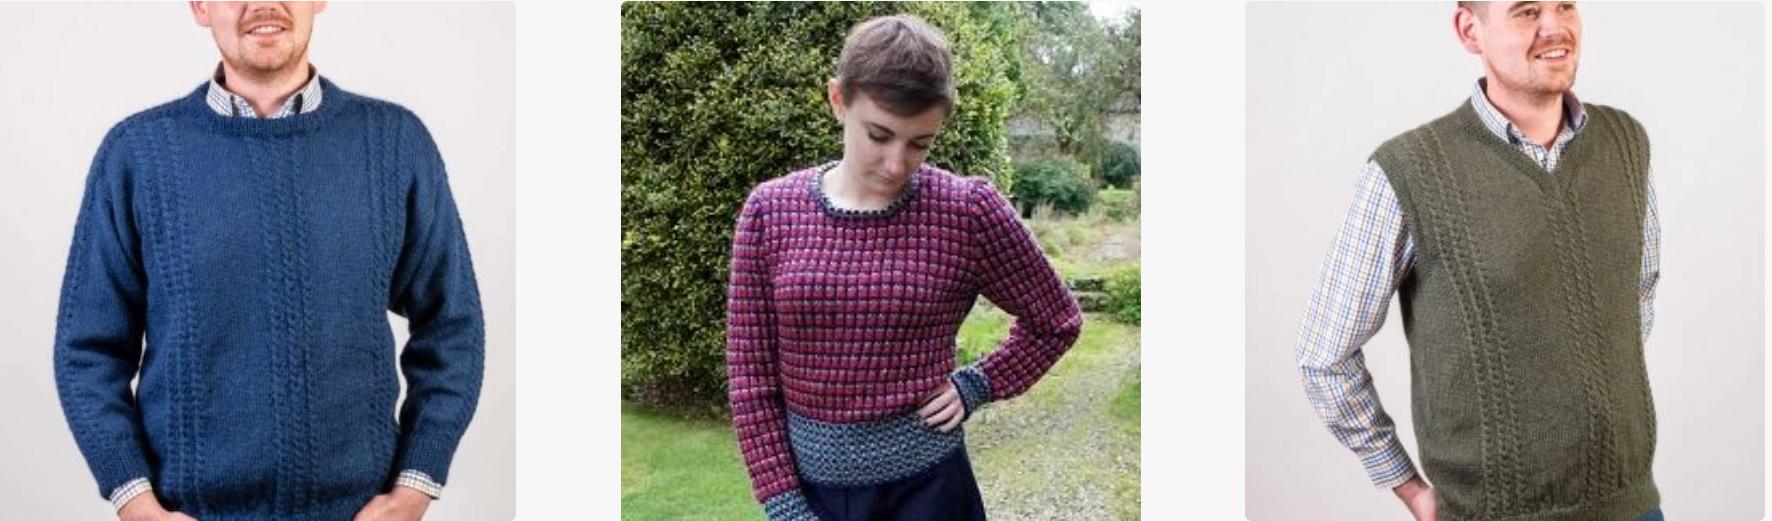 New Wensleydale Longwool Knitting Patterns